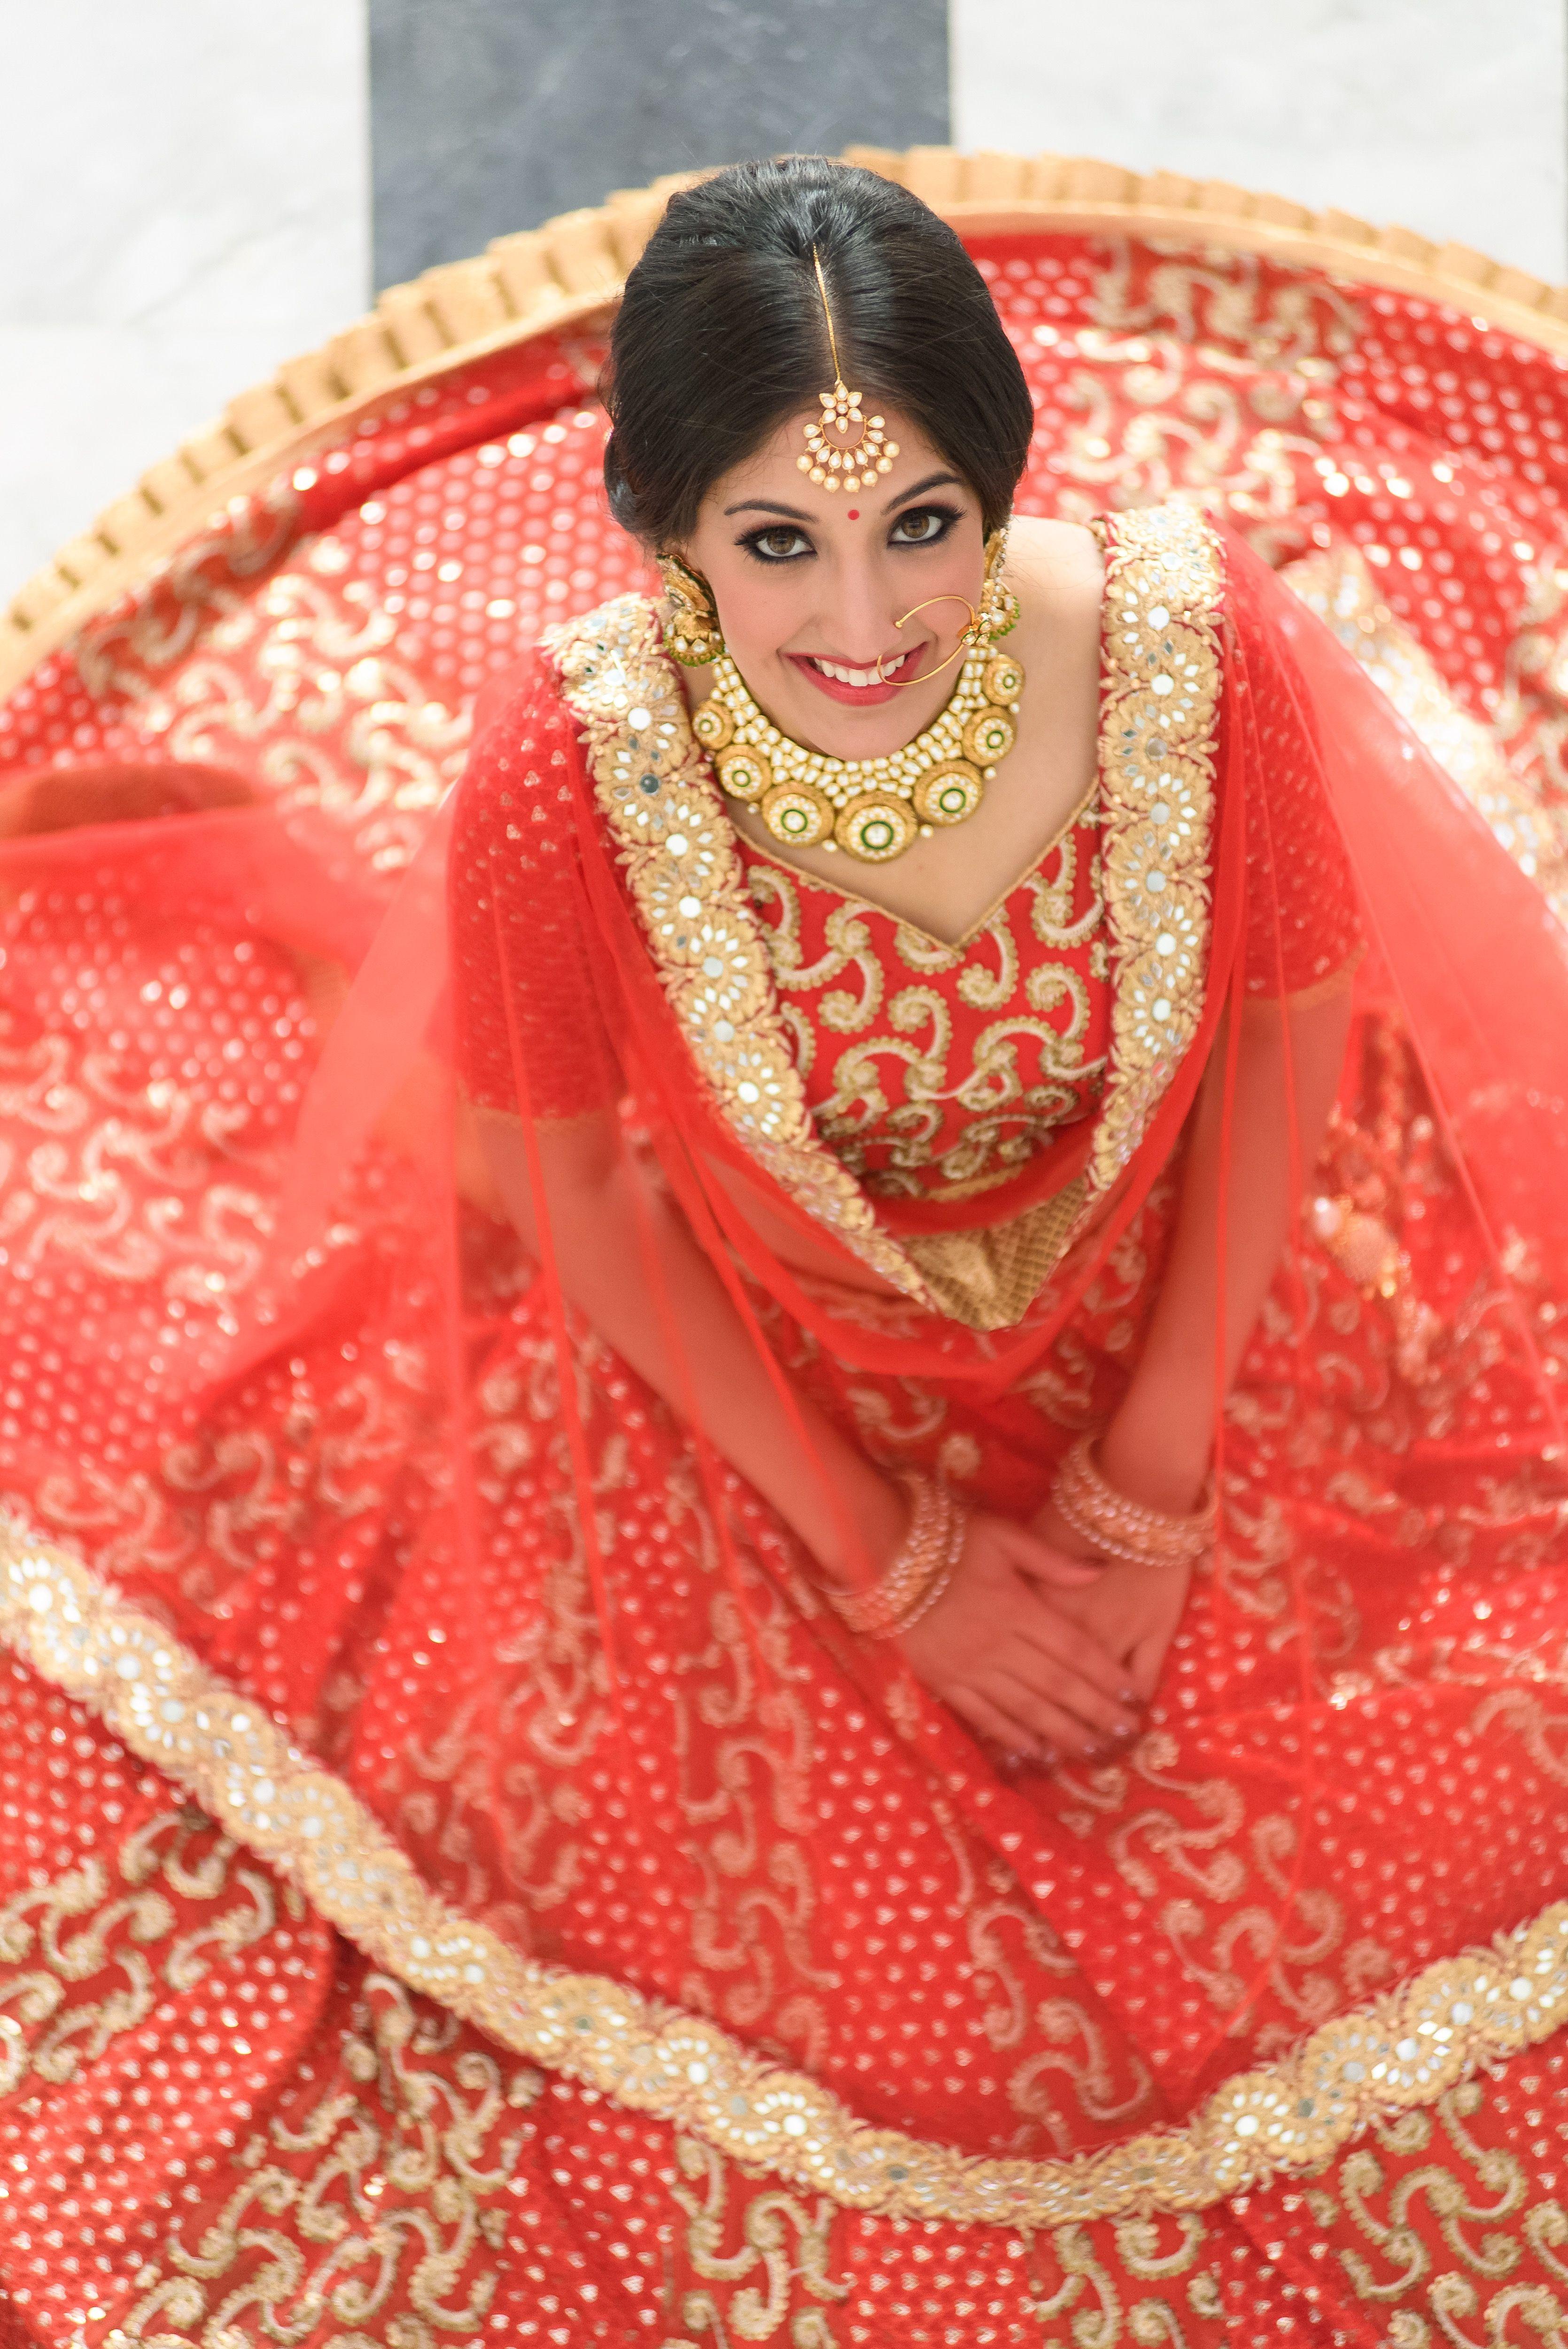 Pre-wedding Photoshoot .... Theme traditional | Pre wedding photoshoot, Indian bride, Wedding ...